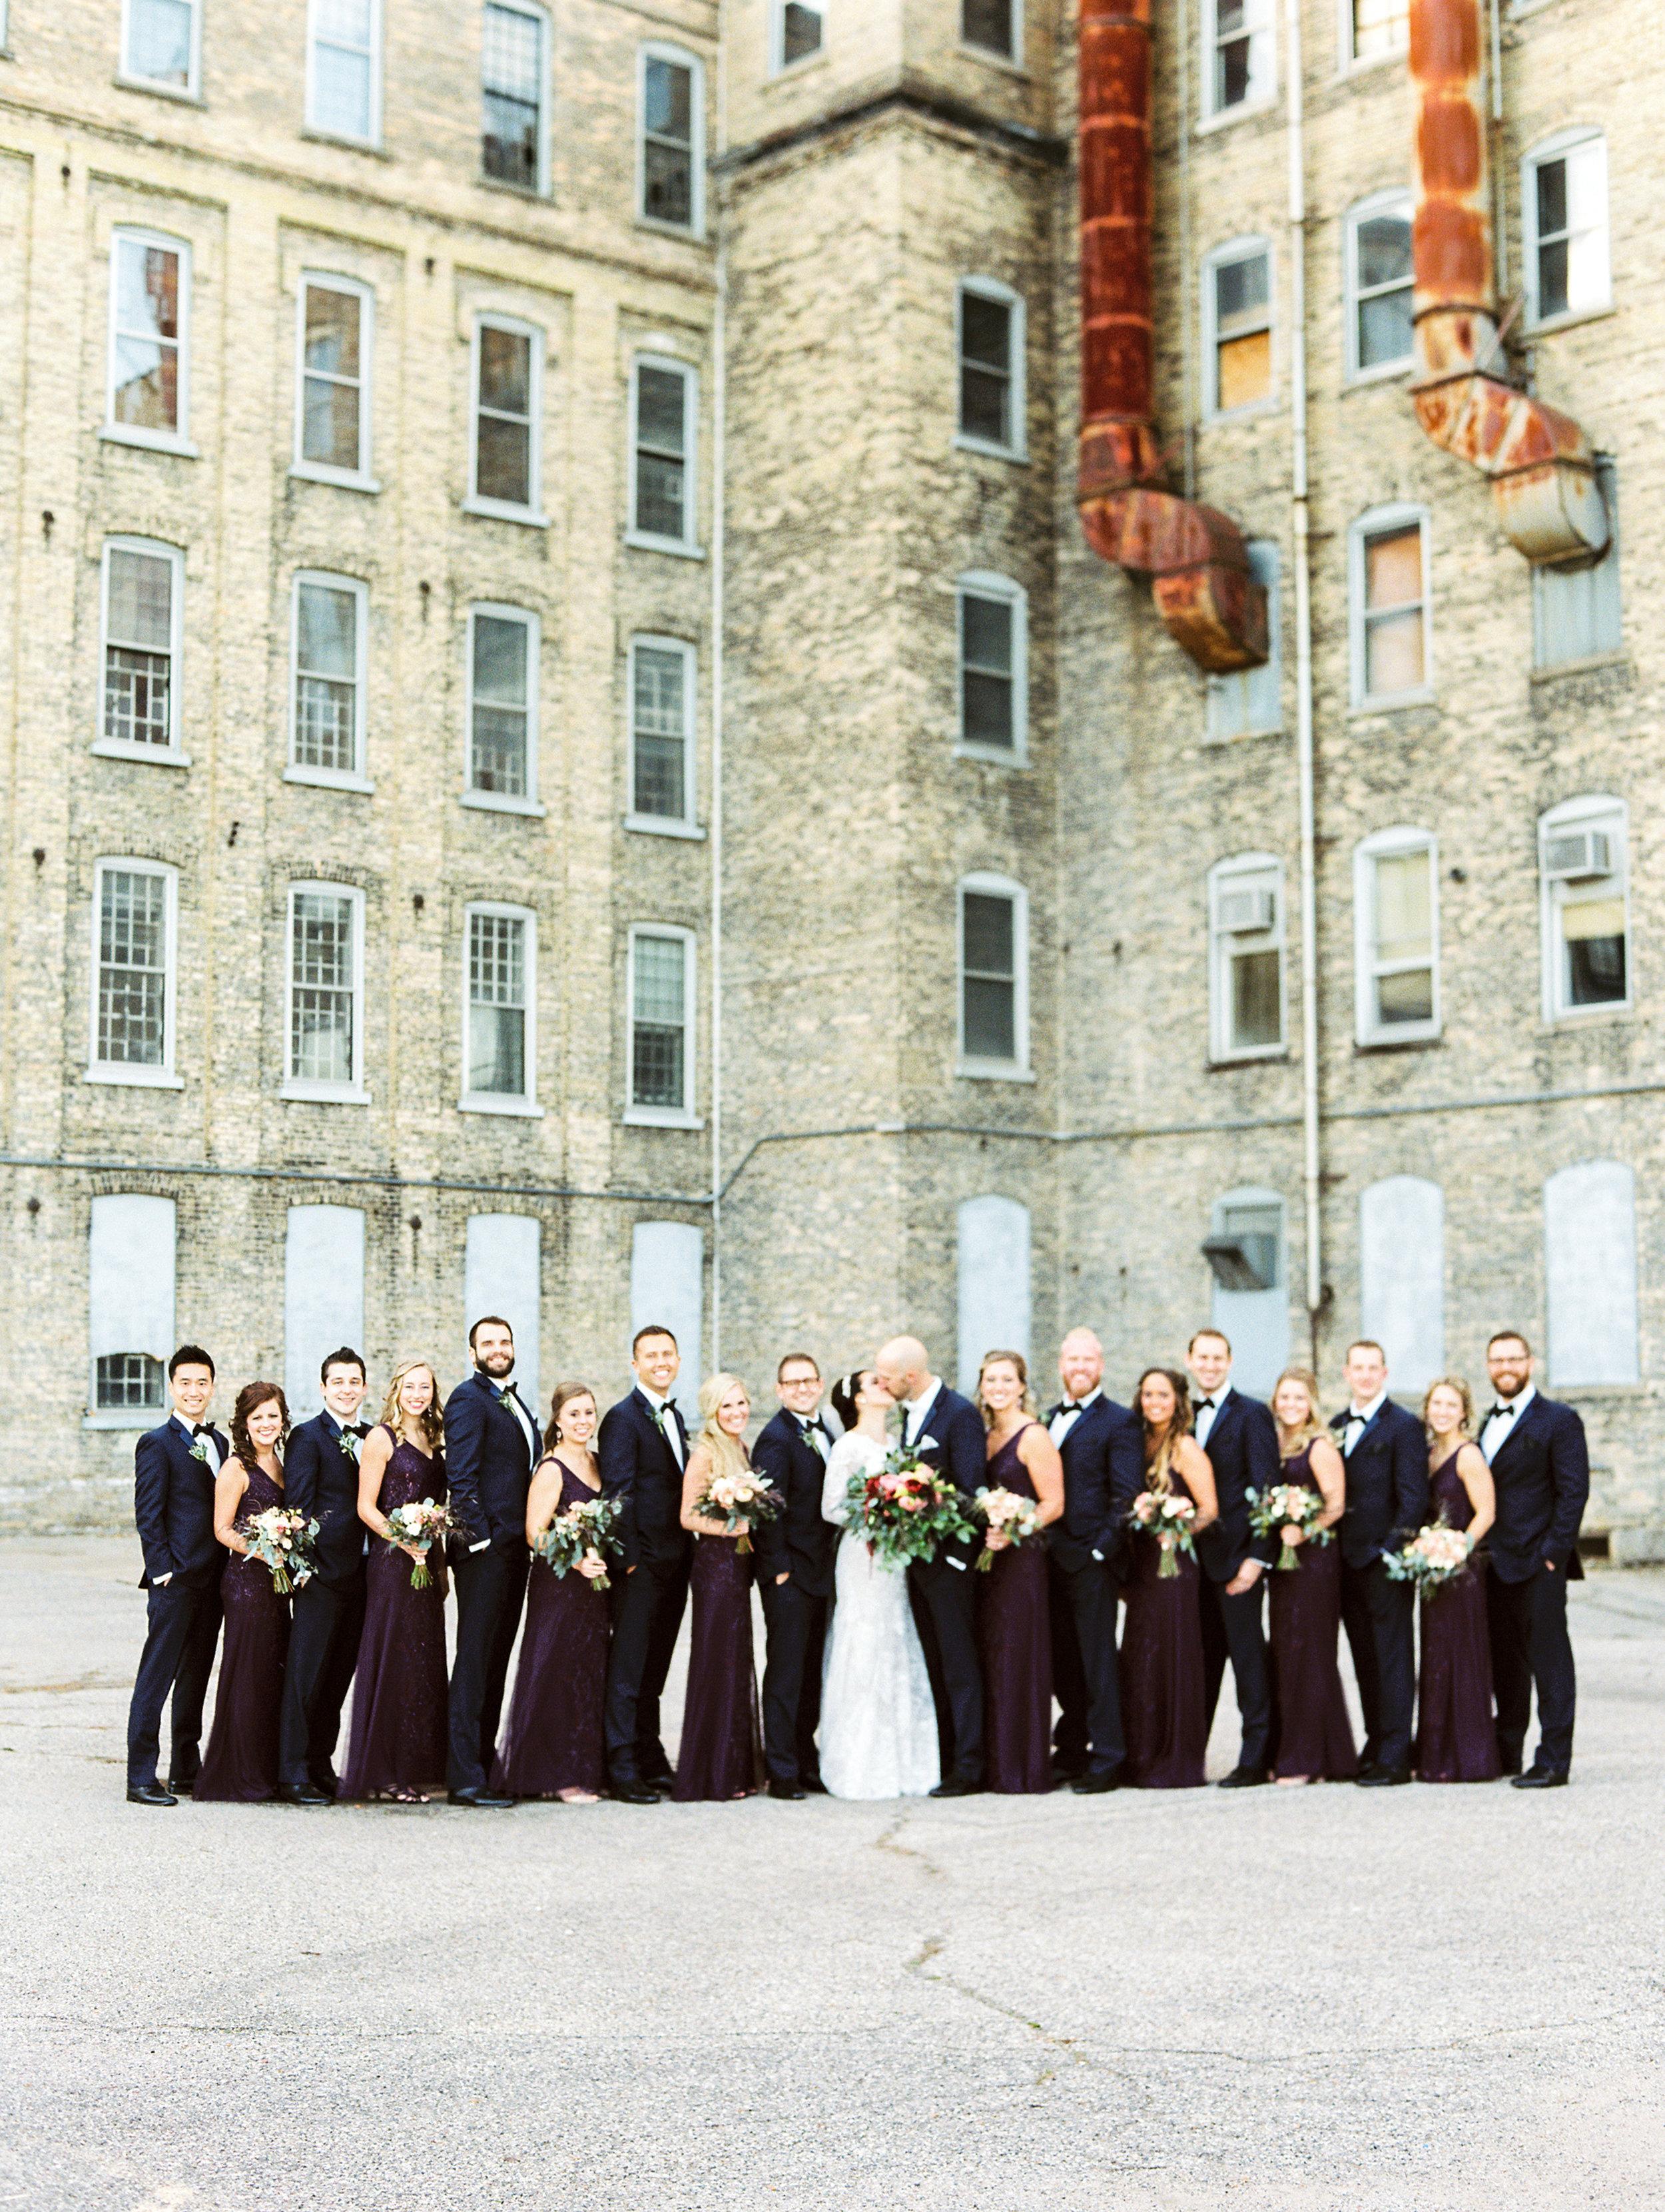 Vogelzang+Wedding+Bridal+Party-51.jpg